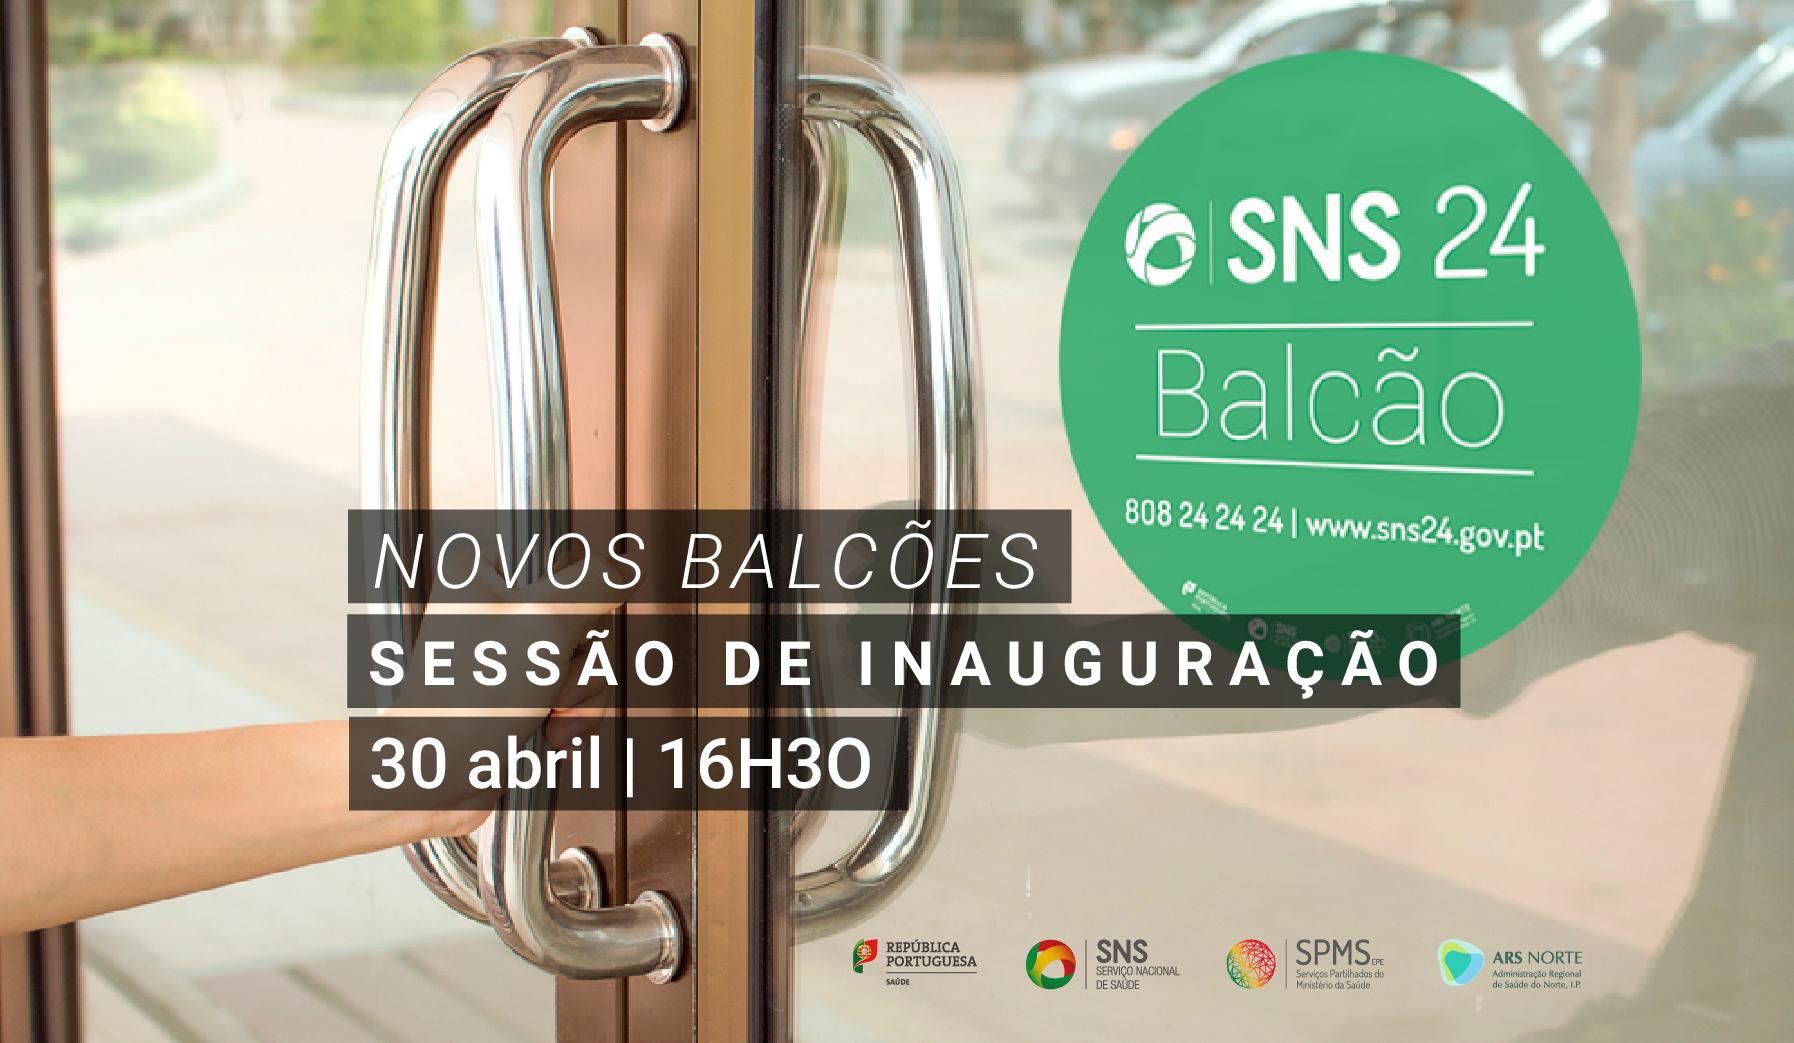 evento SNS24 Balcao-30abril